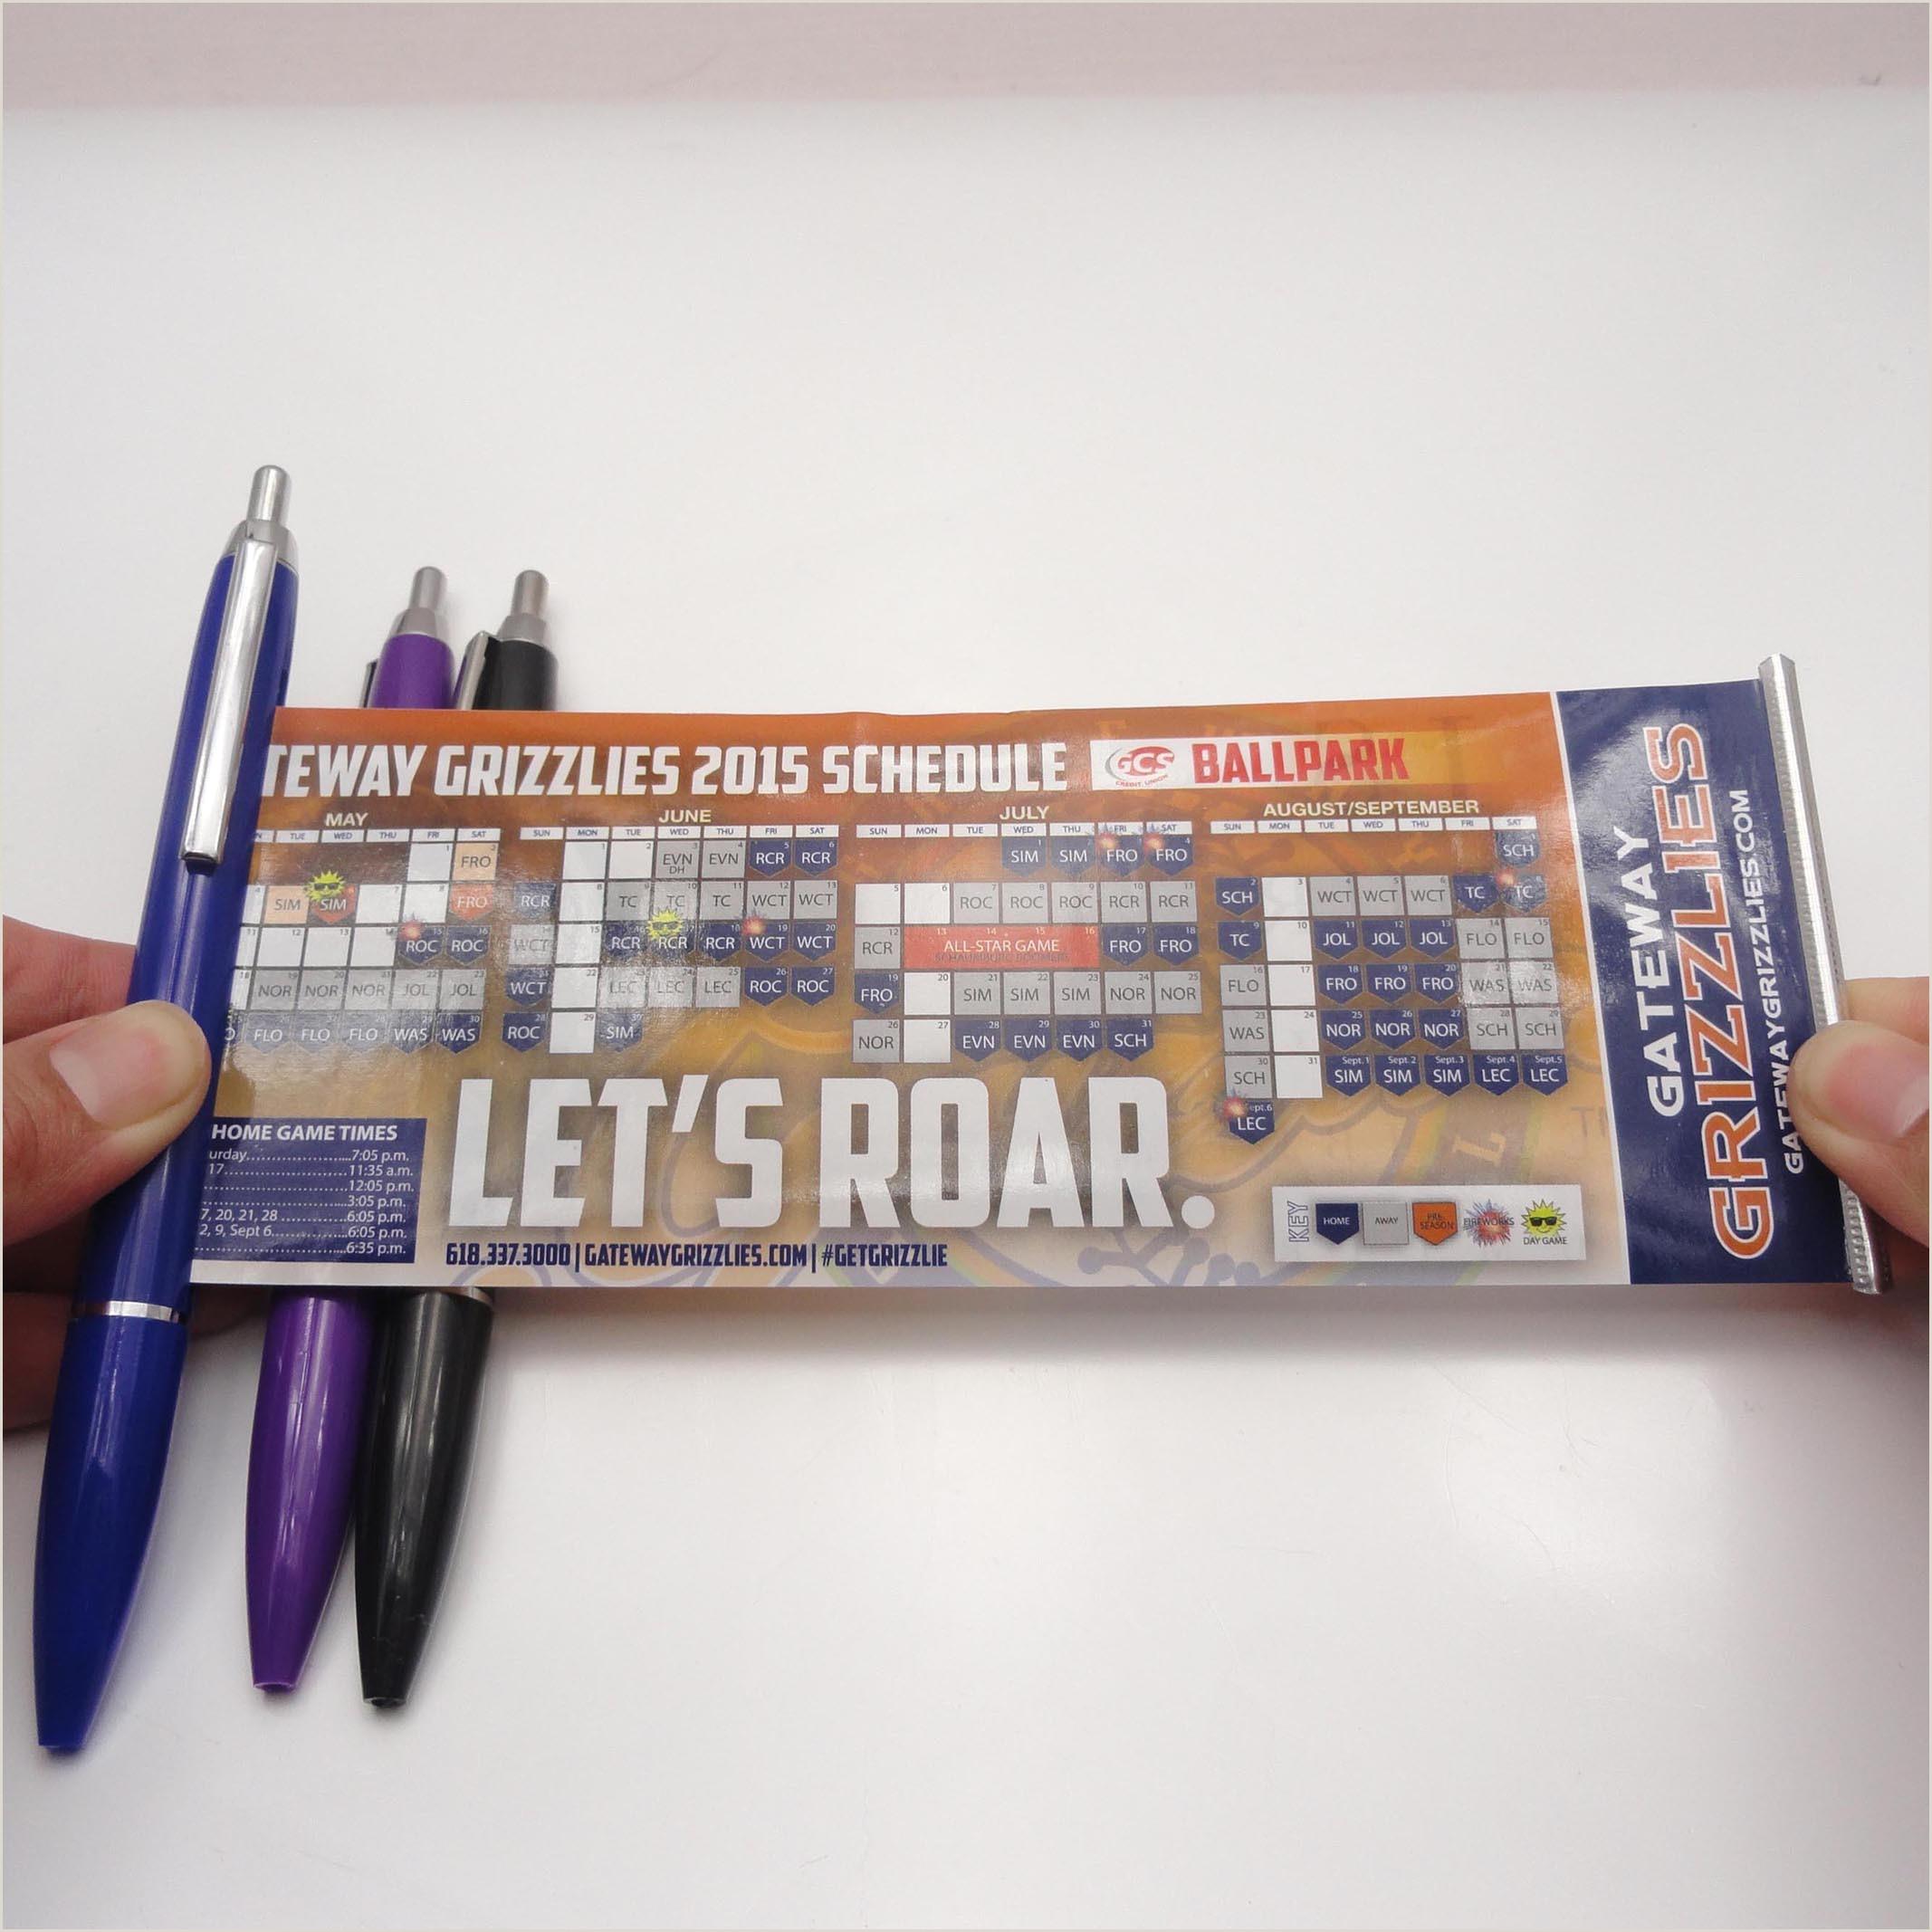 Retractable Banner Pens [hot Item] Promotional Advertisting Banner Pen Pull Out Calendar Flag Pen Xl 9116